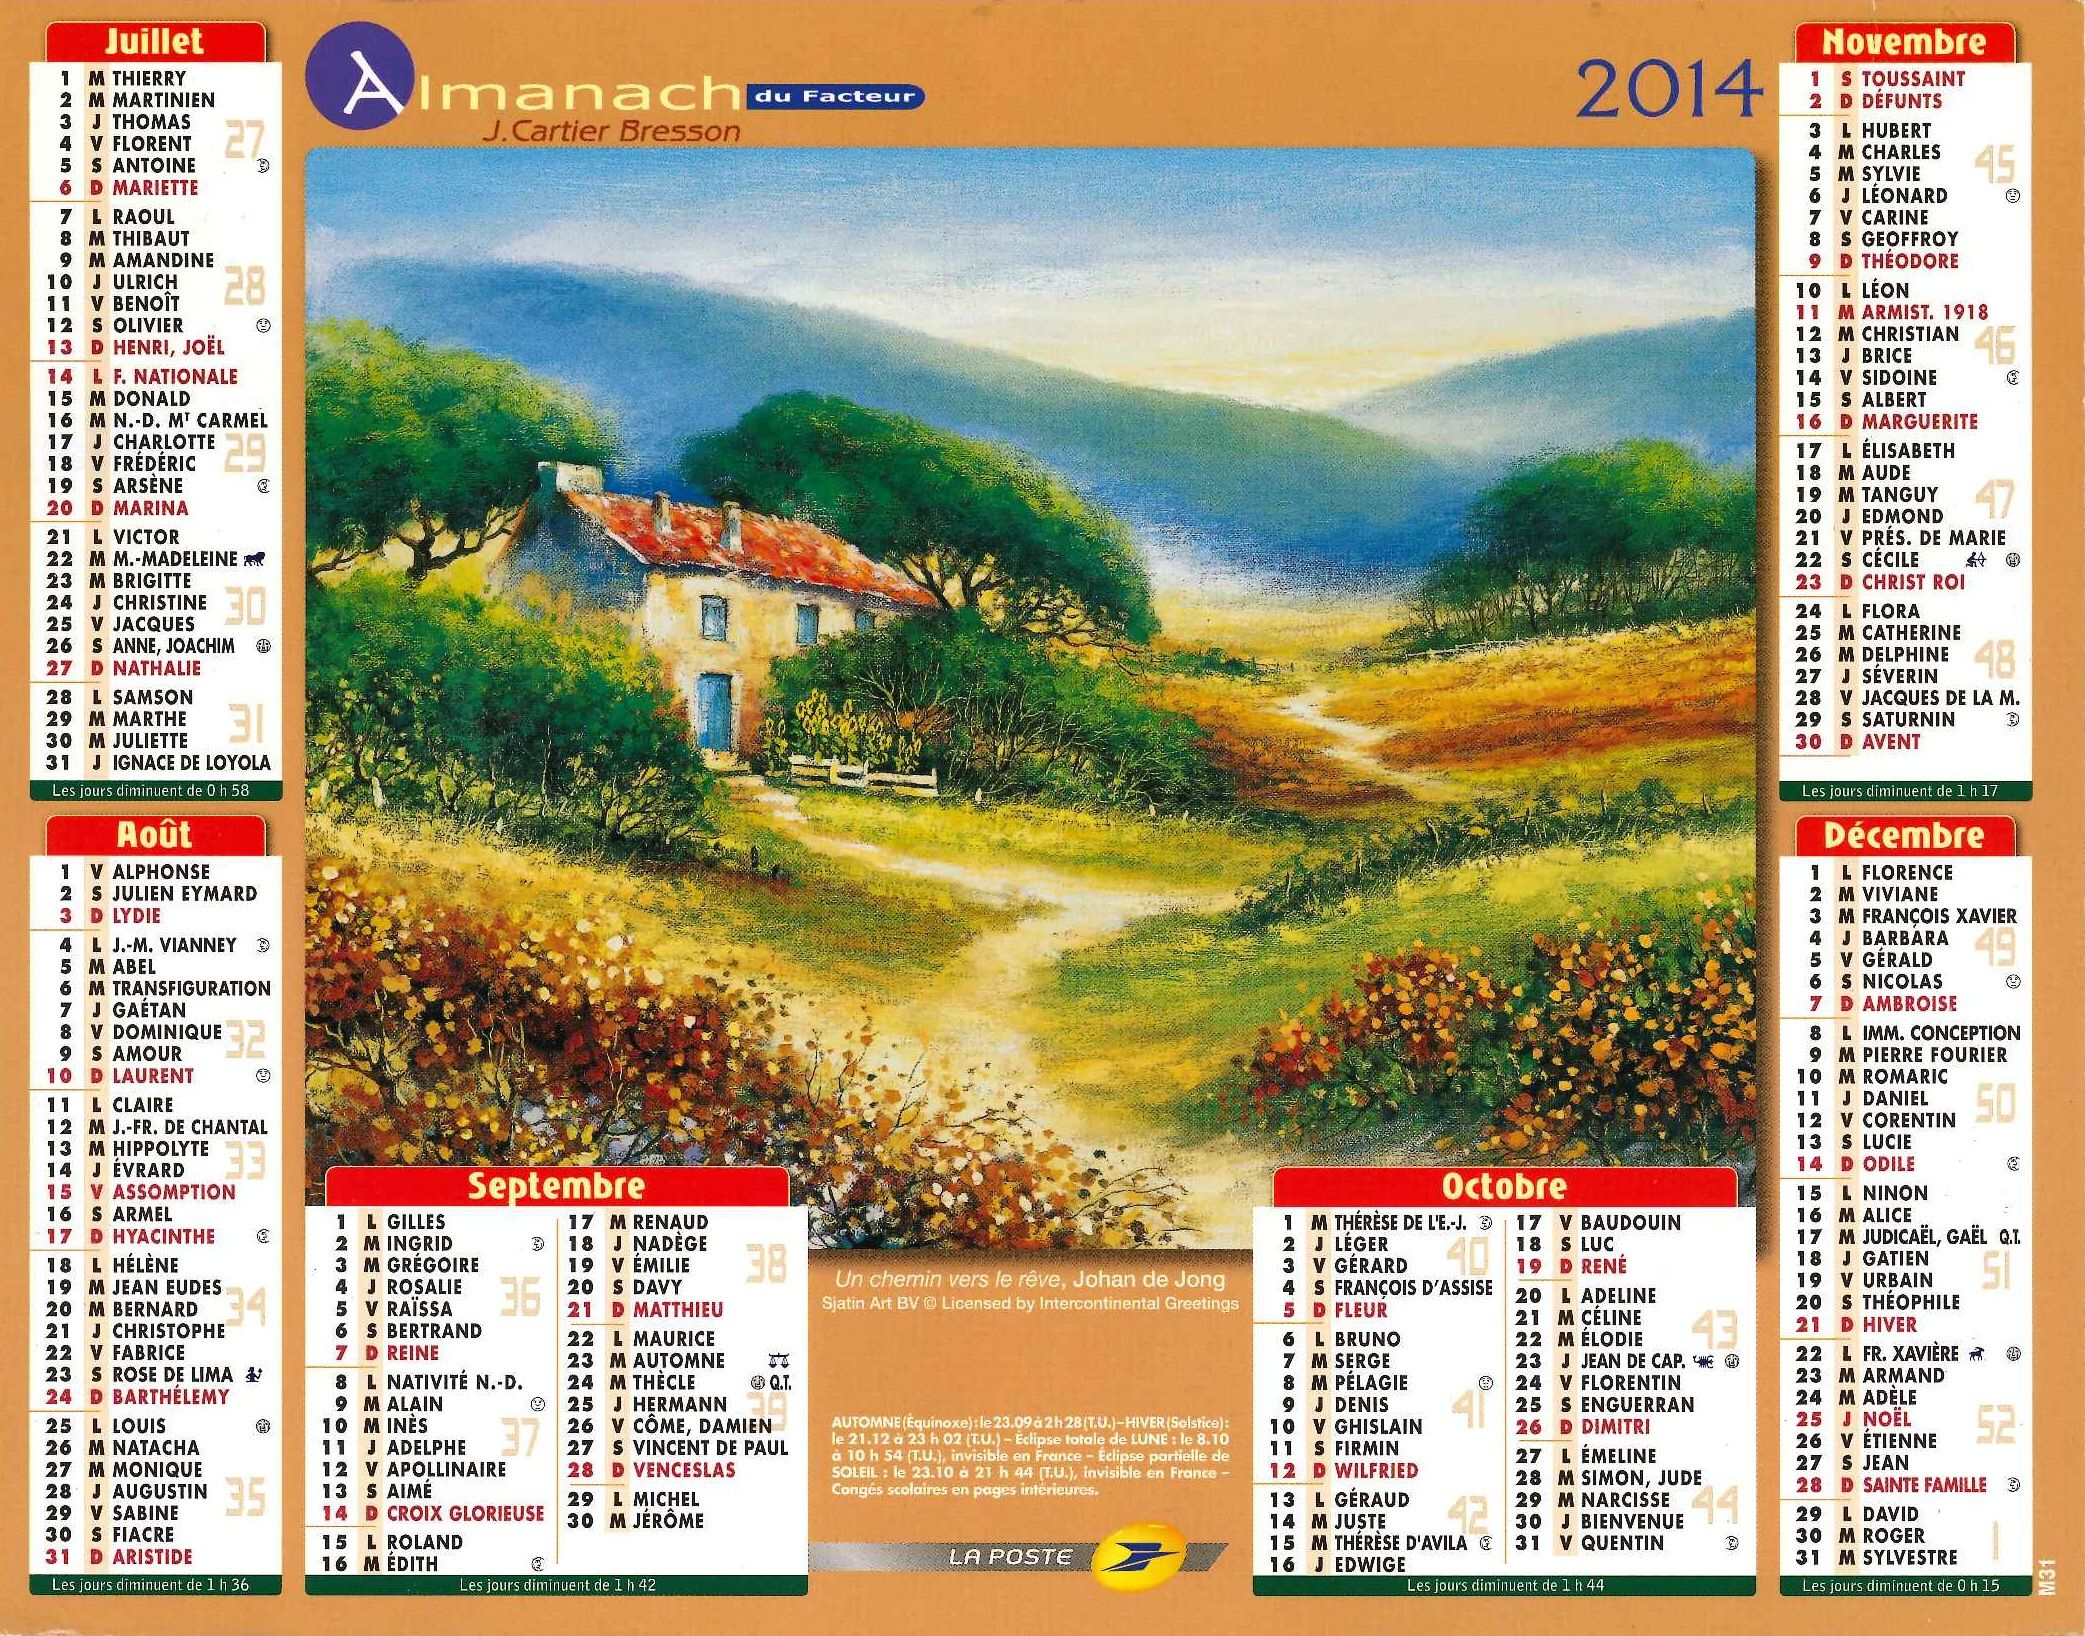 Almanach des Postes 2014 - 2ème Semestre